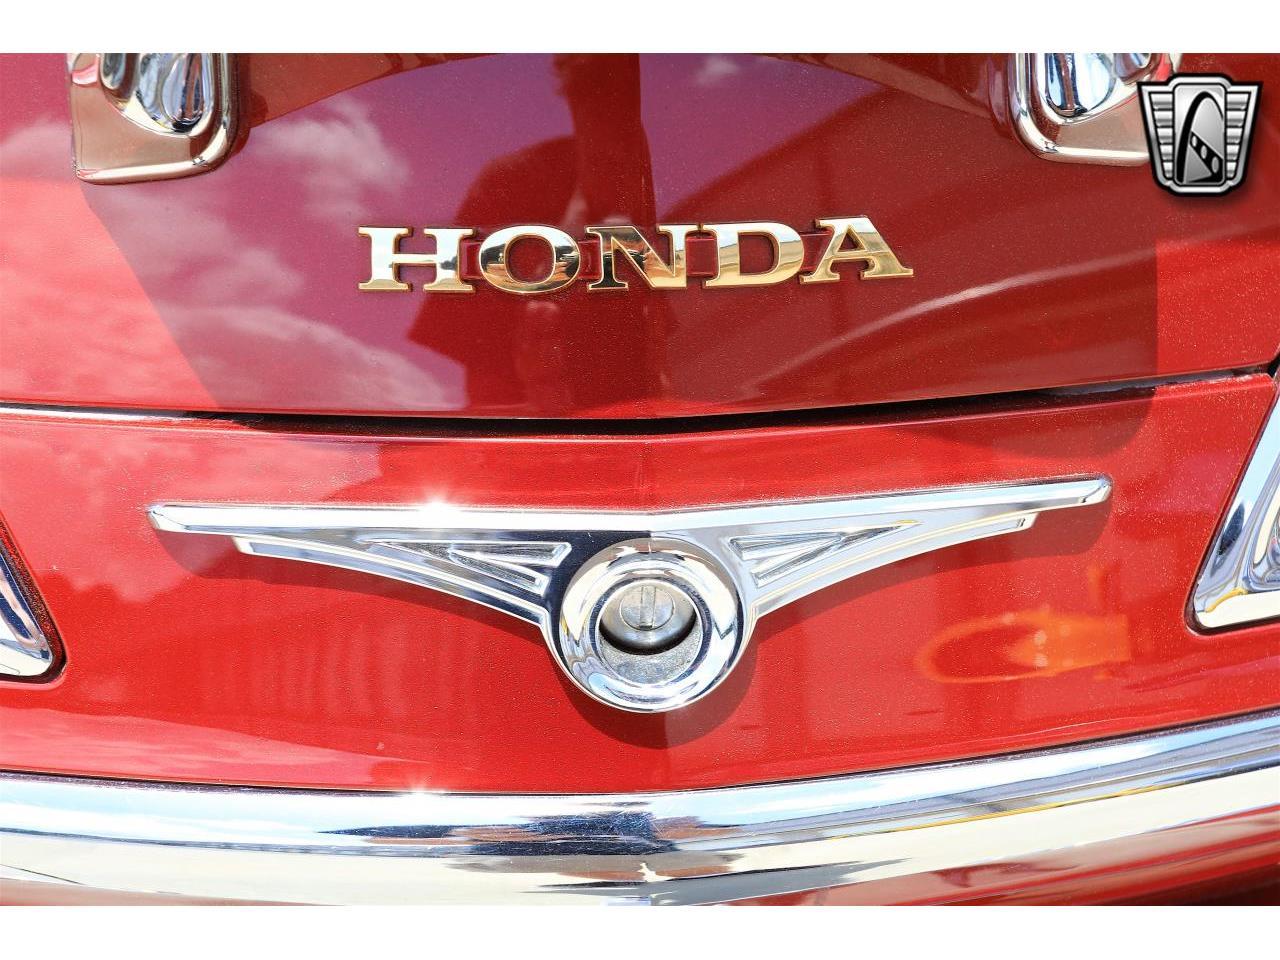 2001 Honda Goldwing (CC-1340635) for sale in O'Fallon, Illinois